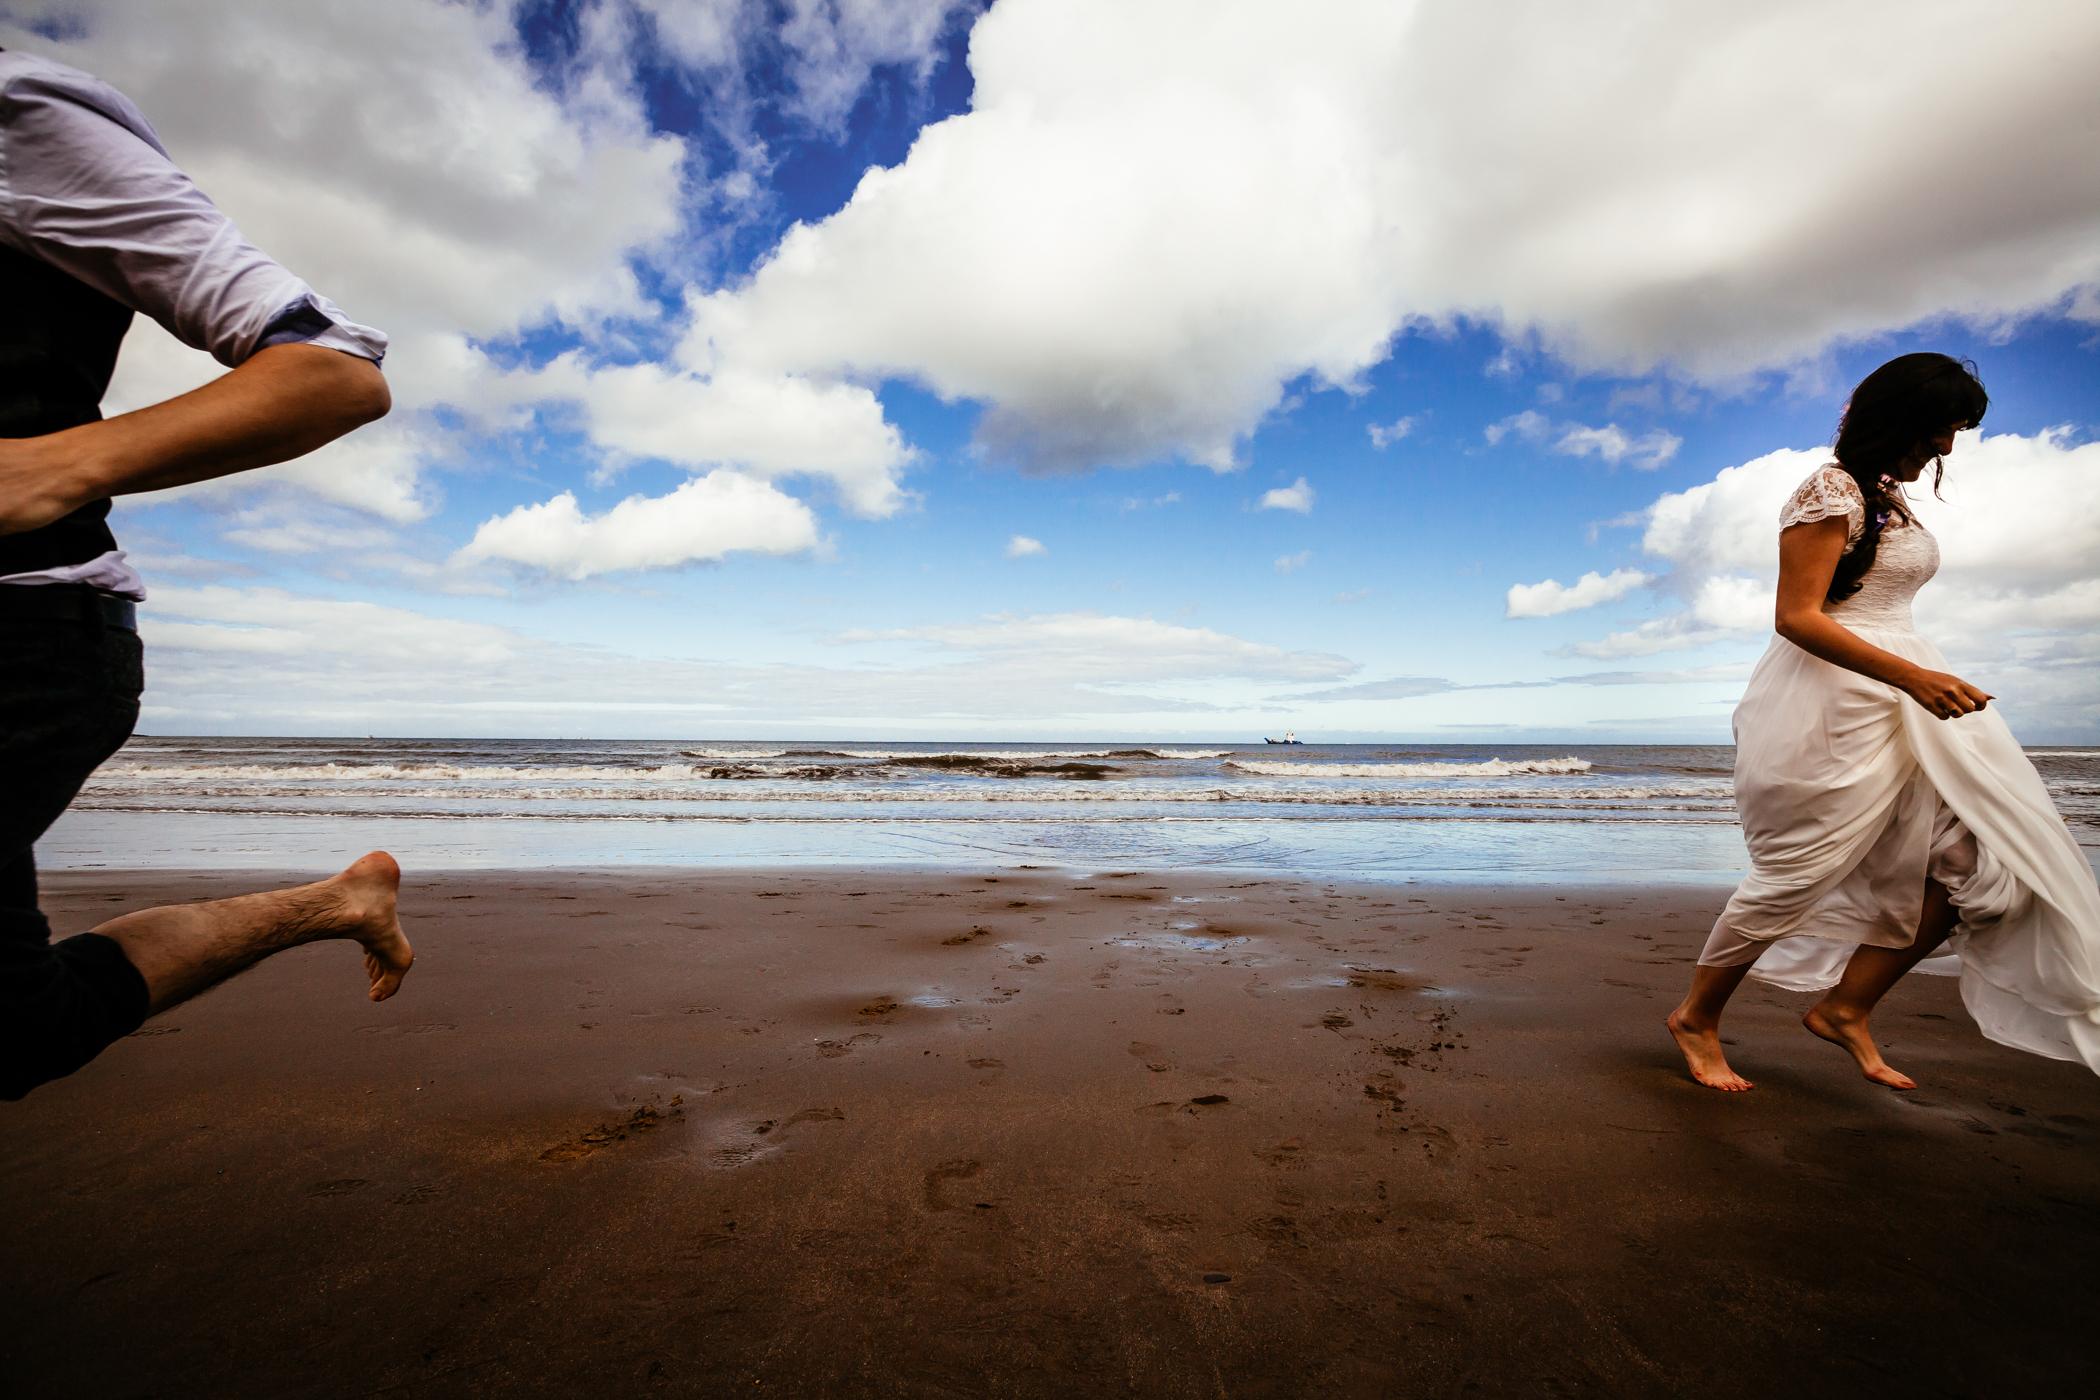 sansom photography beach wedding photography charlotte & mike-61